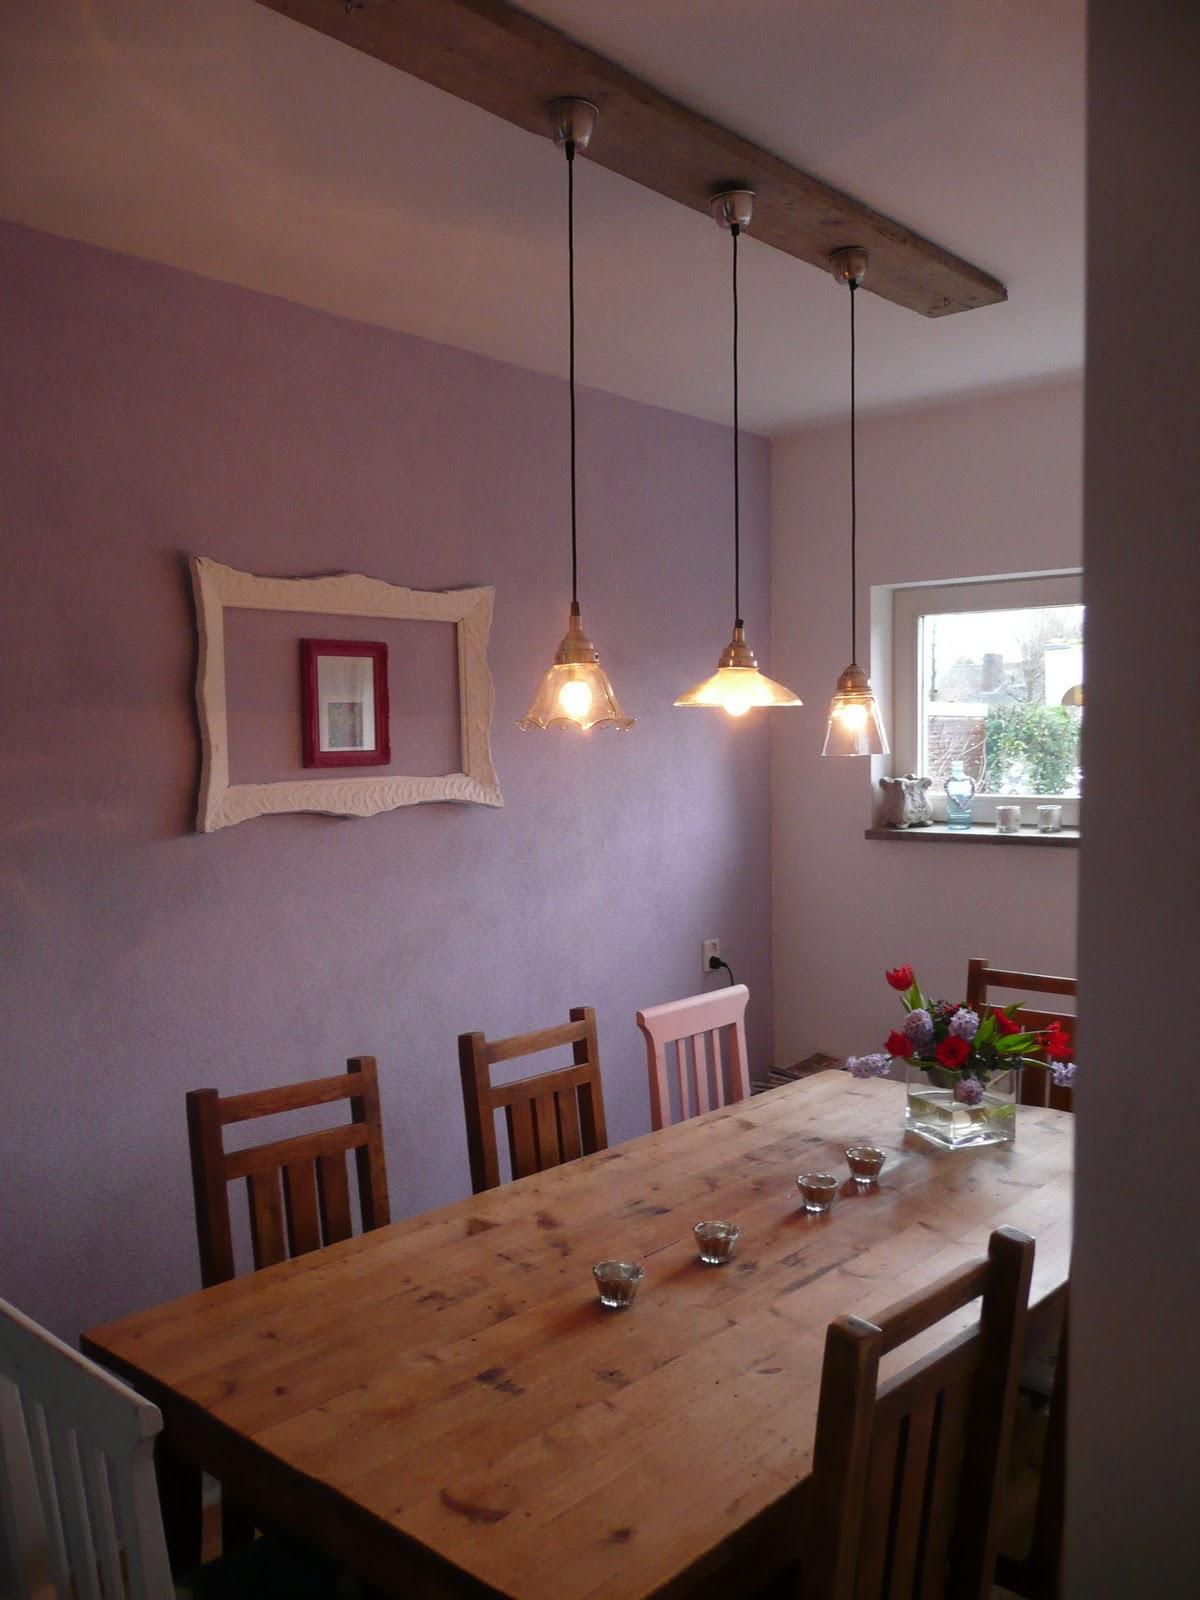 de gepimpte bolderkar lampen. Black Bedroom Furniture Sets. Home Design Ideas